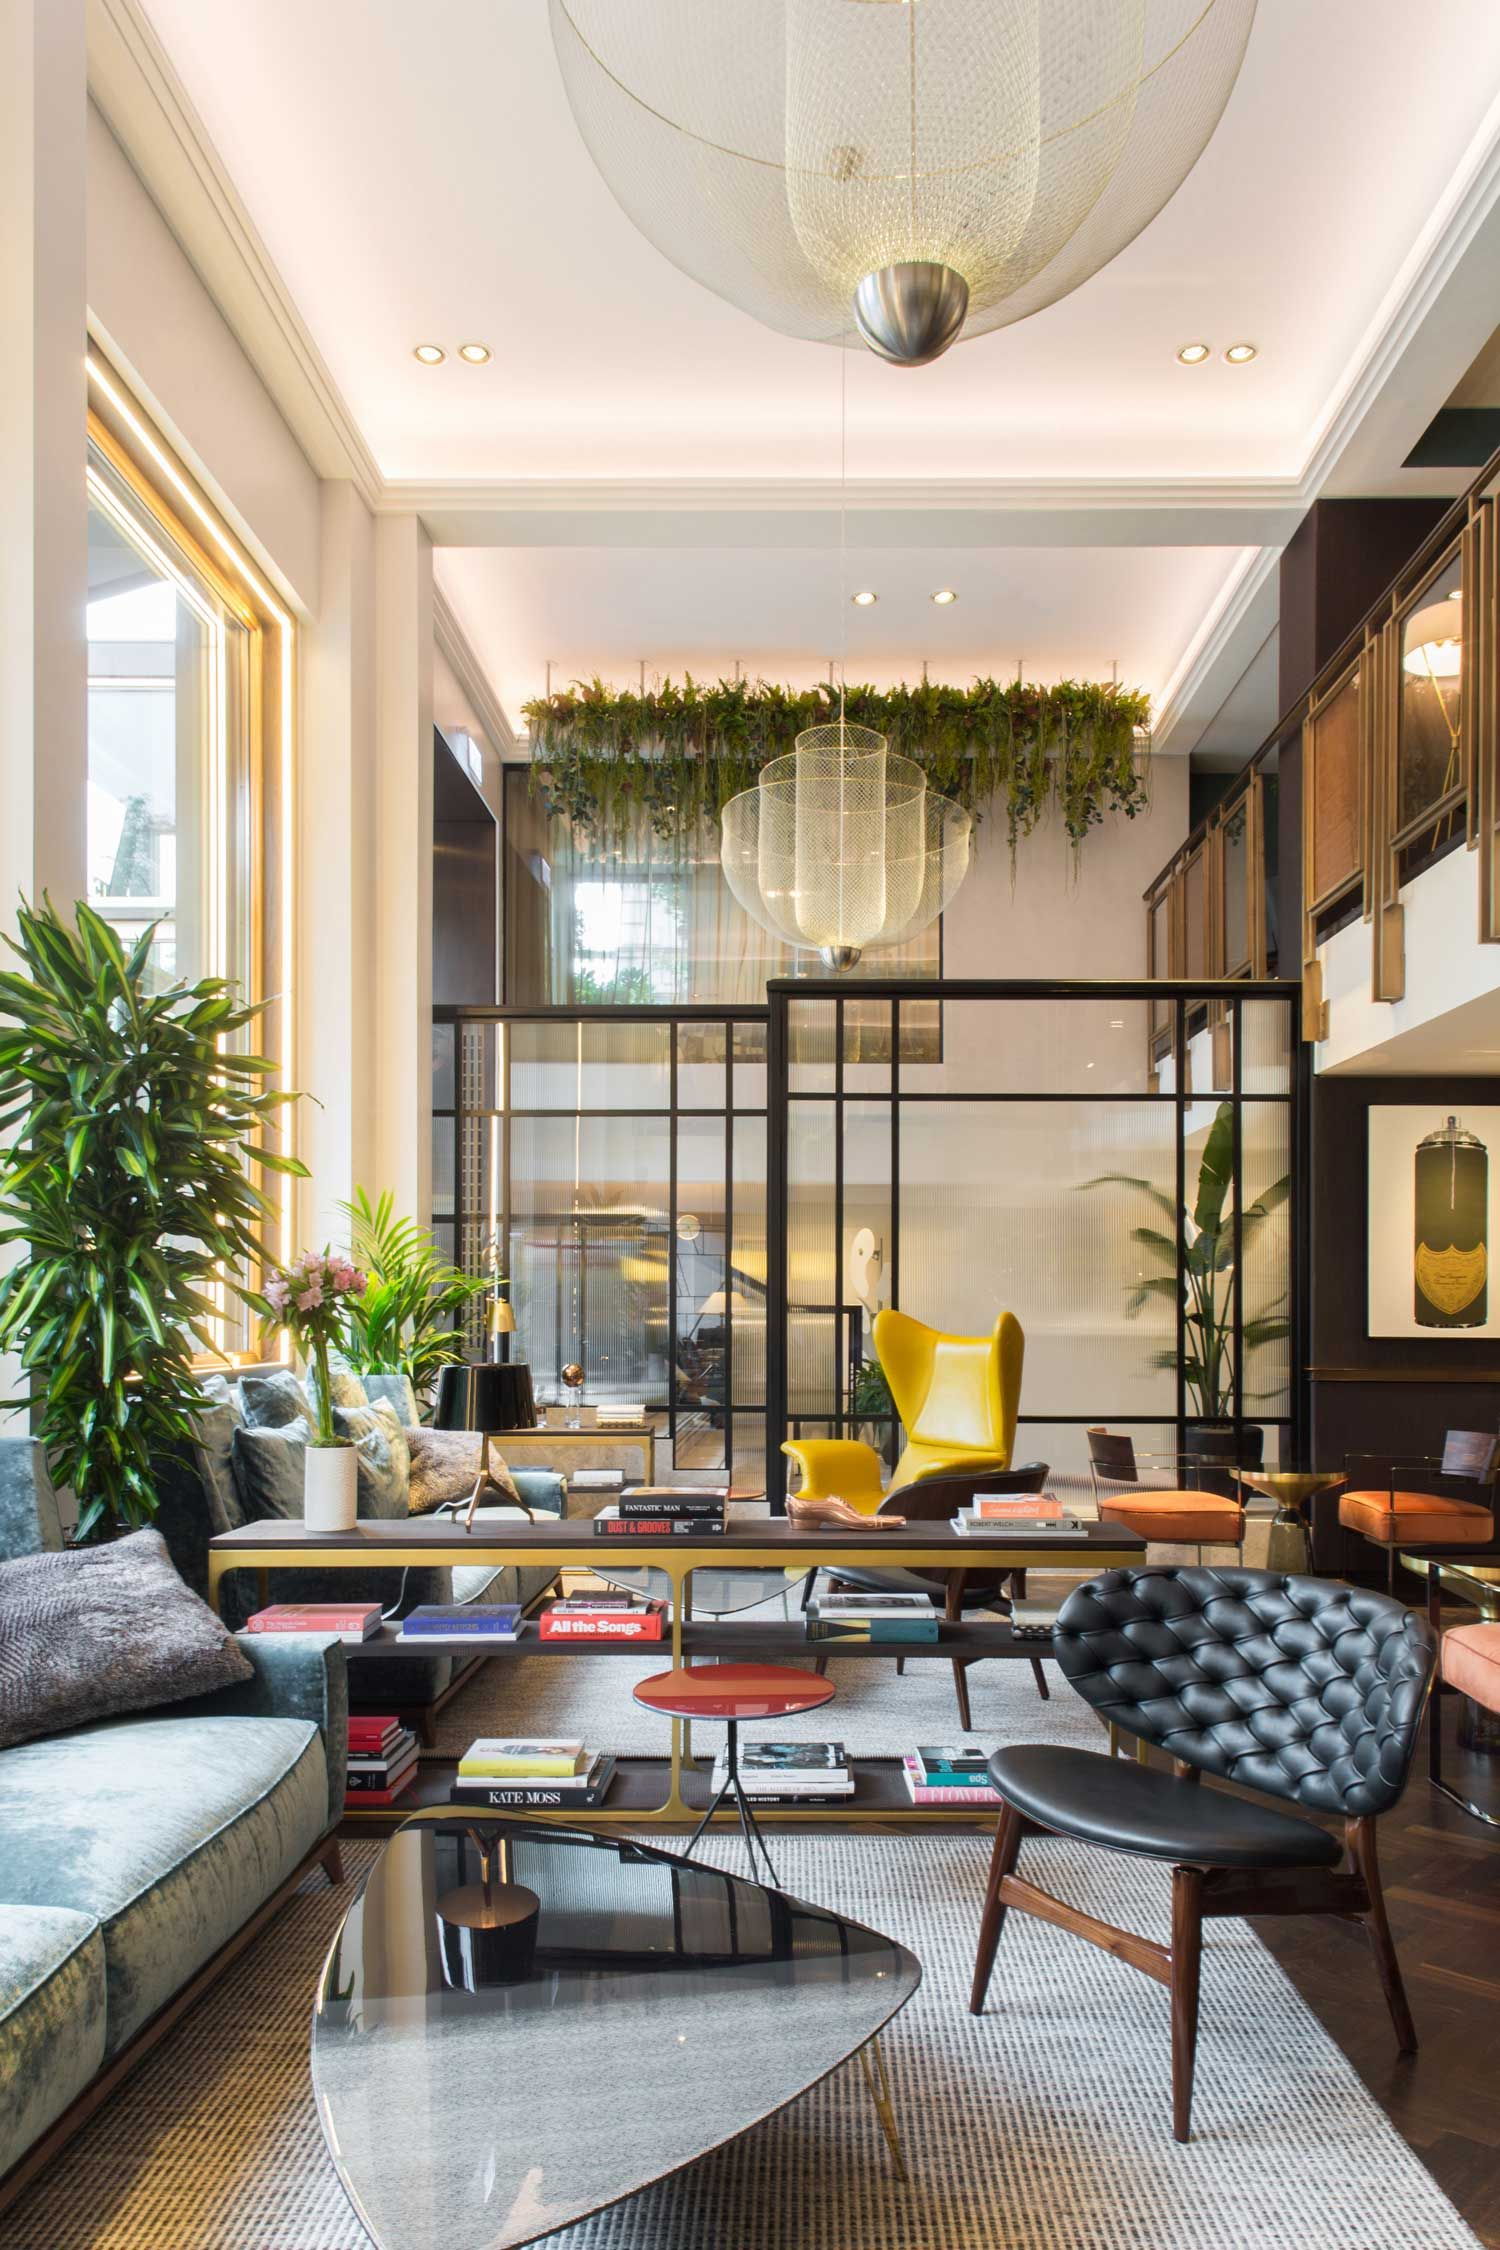 Athenaeum Hotel & Residences by Kinnersley Kent Design